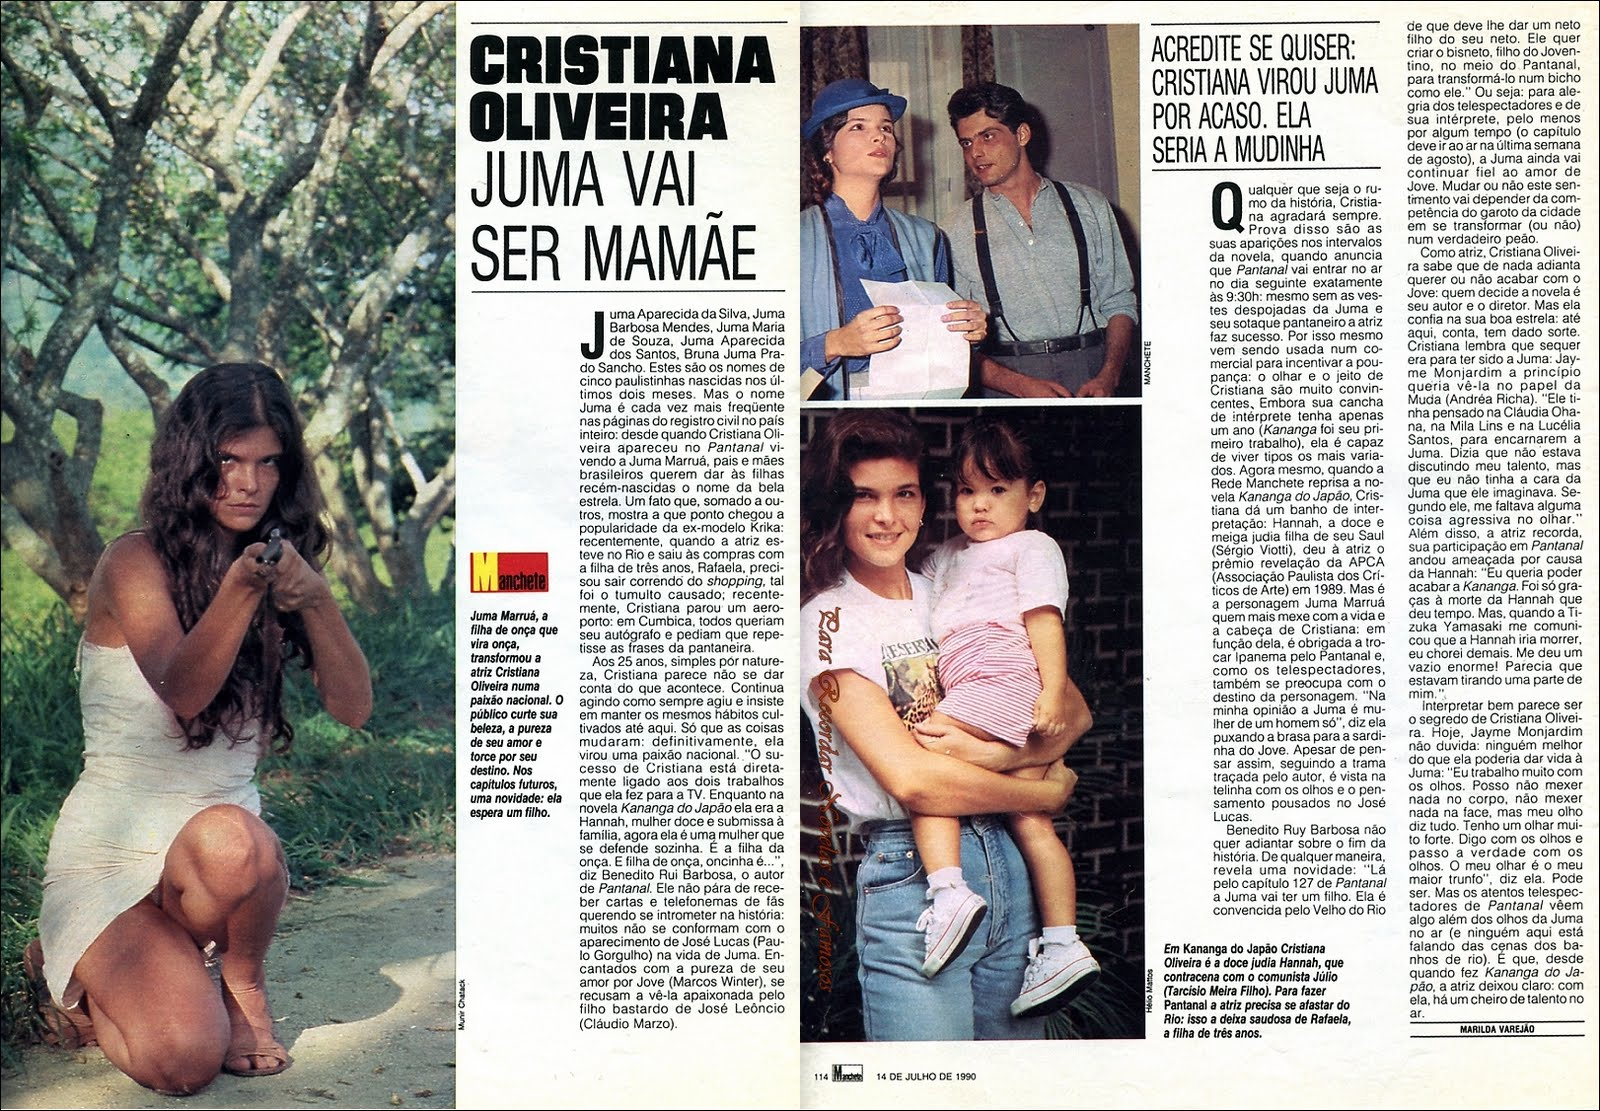 http://4.bp.blogspot.com/_HG6XckfYr38/TSYWFr0l_pI/AAAAAAAAeP0/60s3hsA8svc/s1600/Cristiana-Oliveira-1990%2Bcompl.jpg